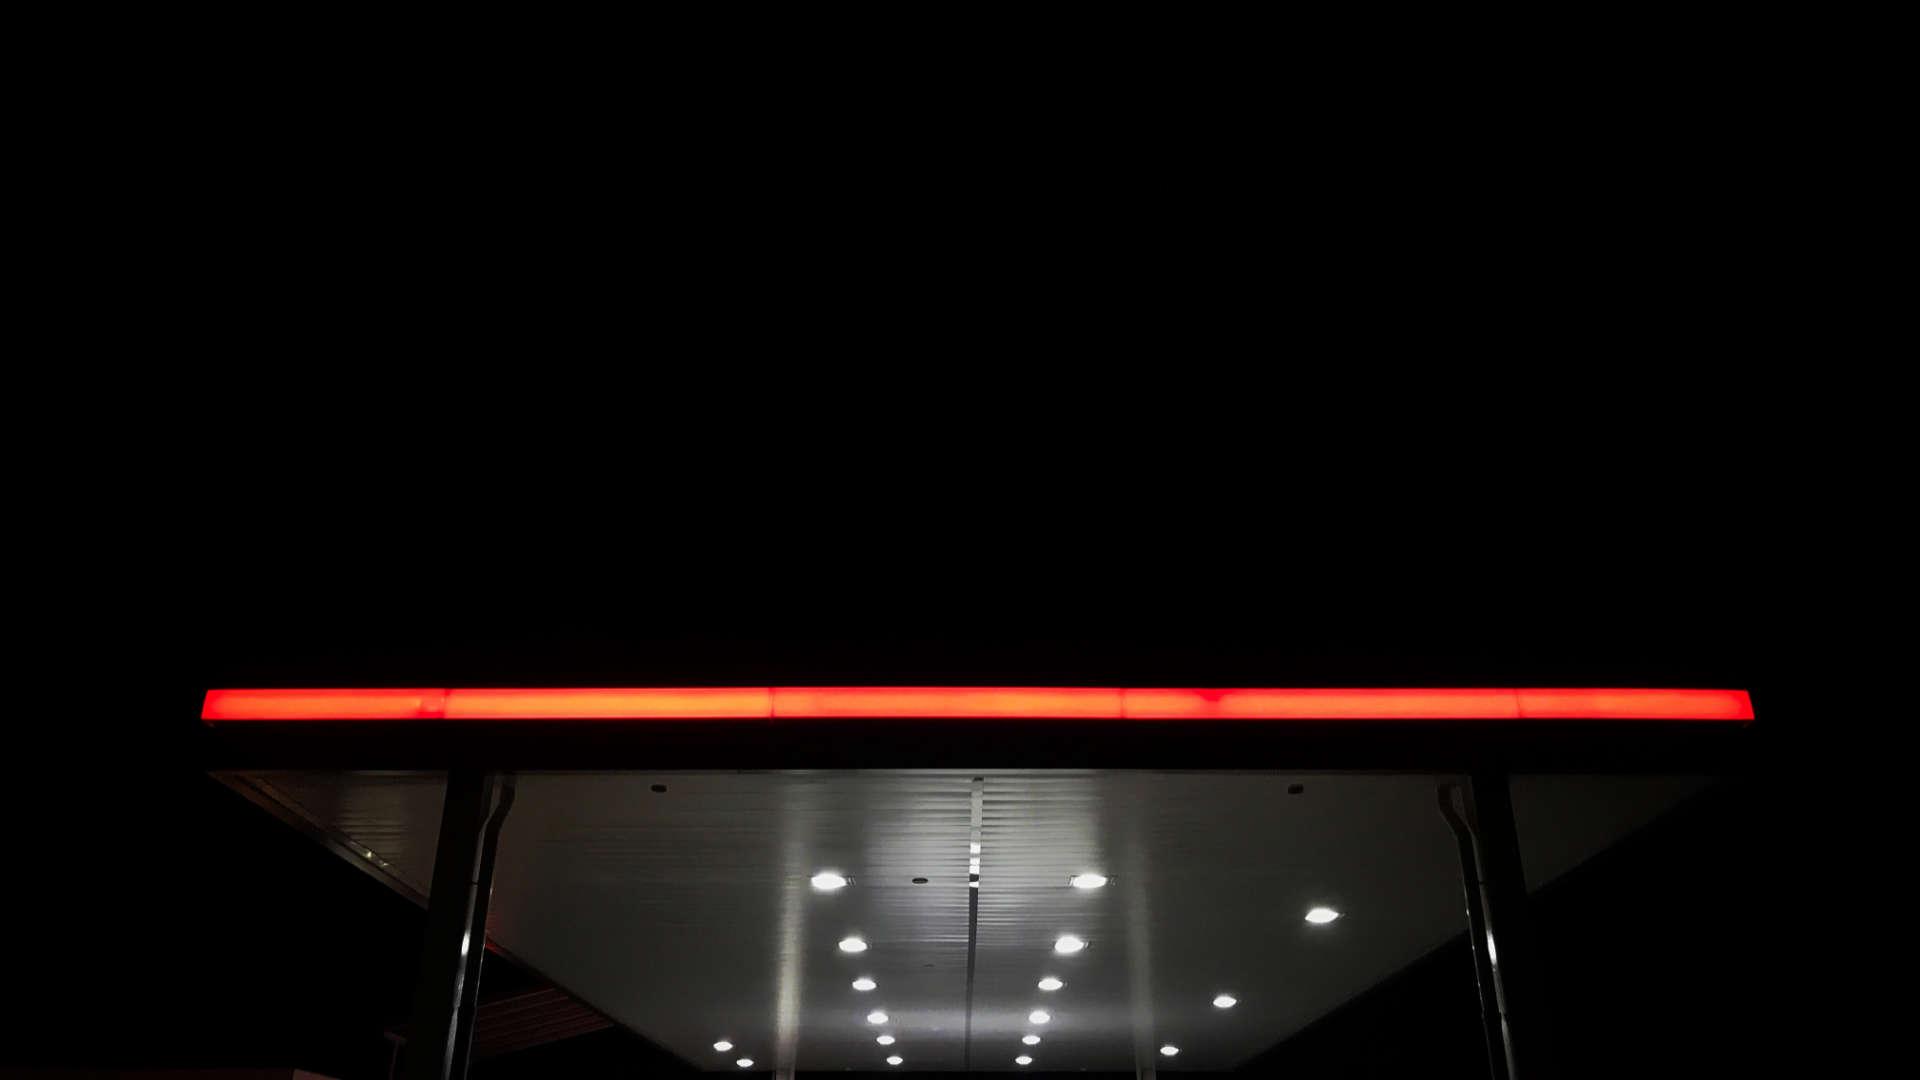 rode lijn overkapping tankstation werkhorst meppel